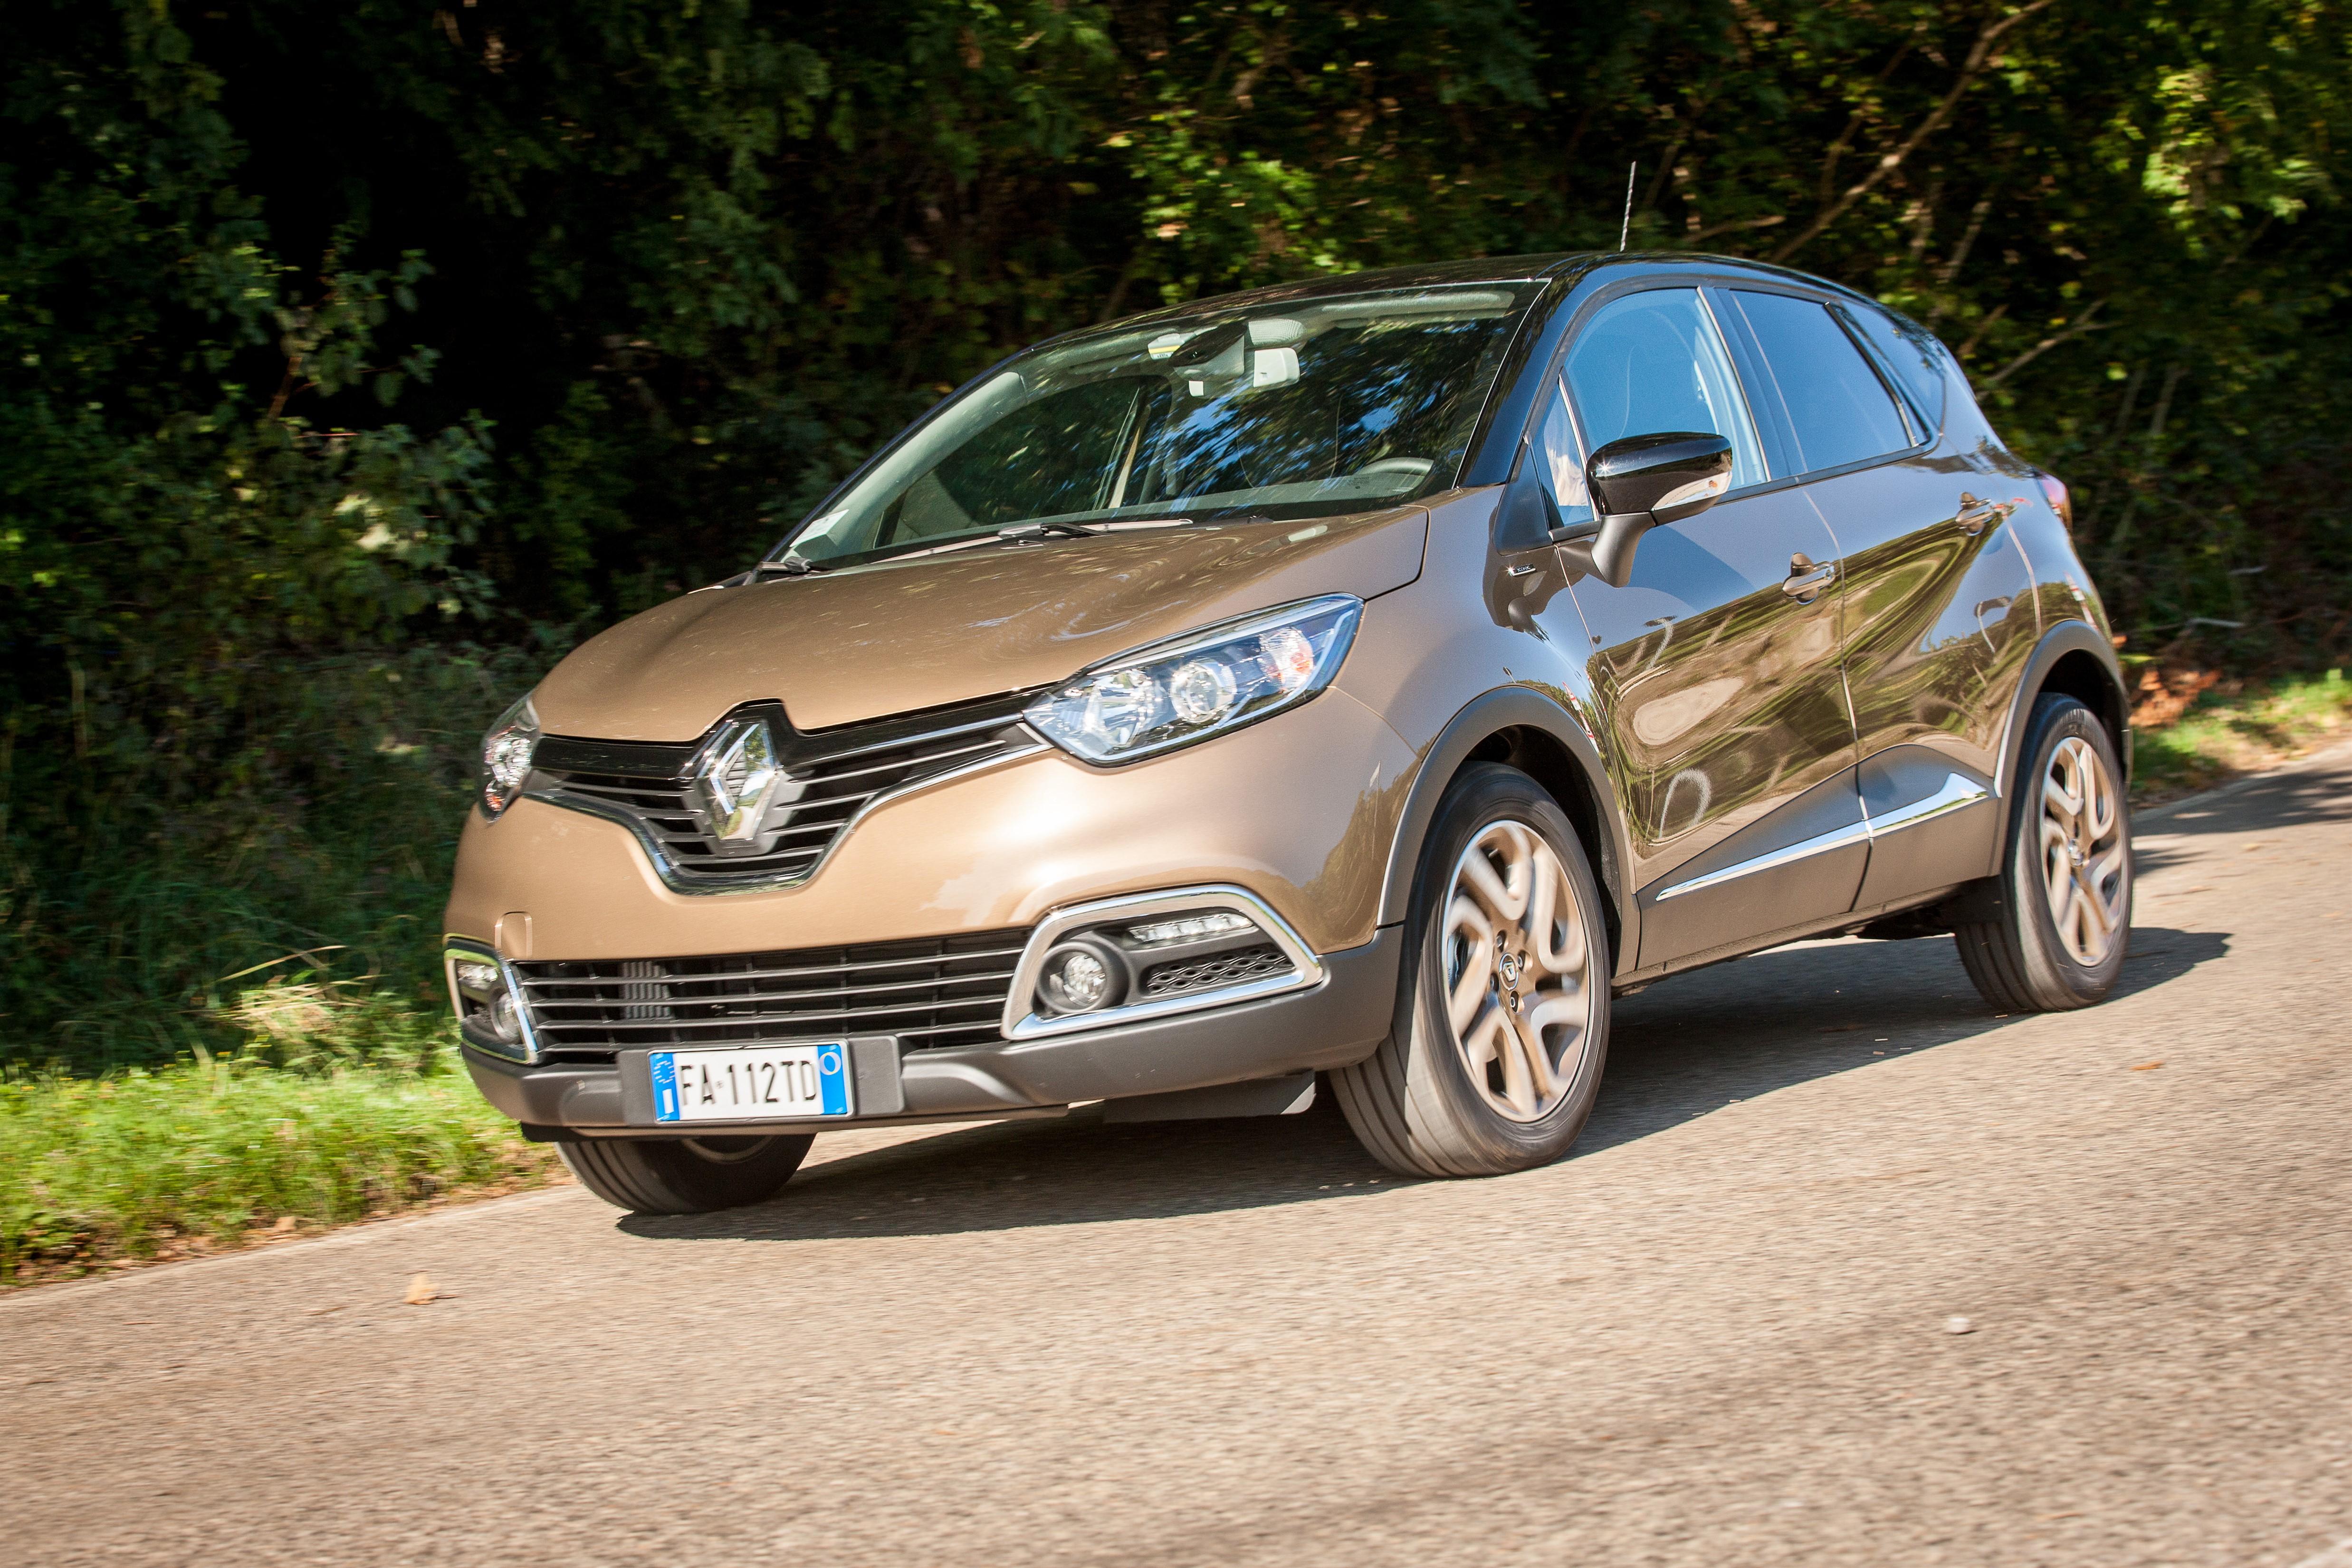 Renault: sforamento, ma non frodi volontarie